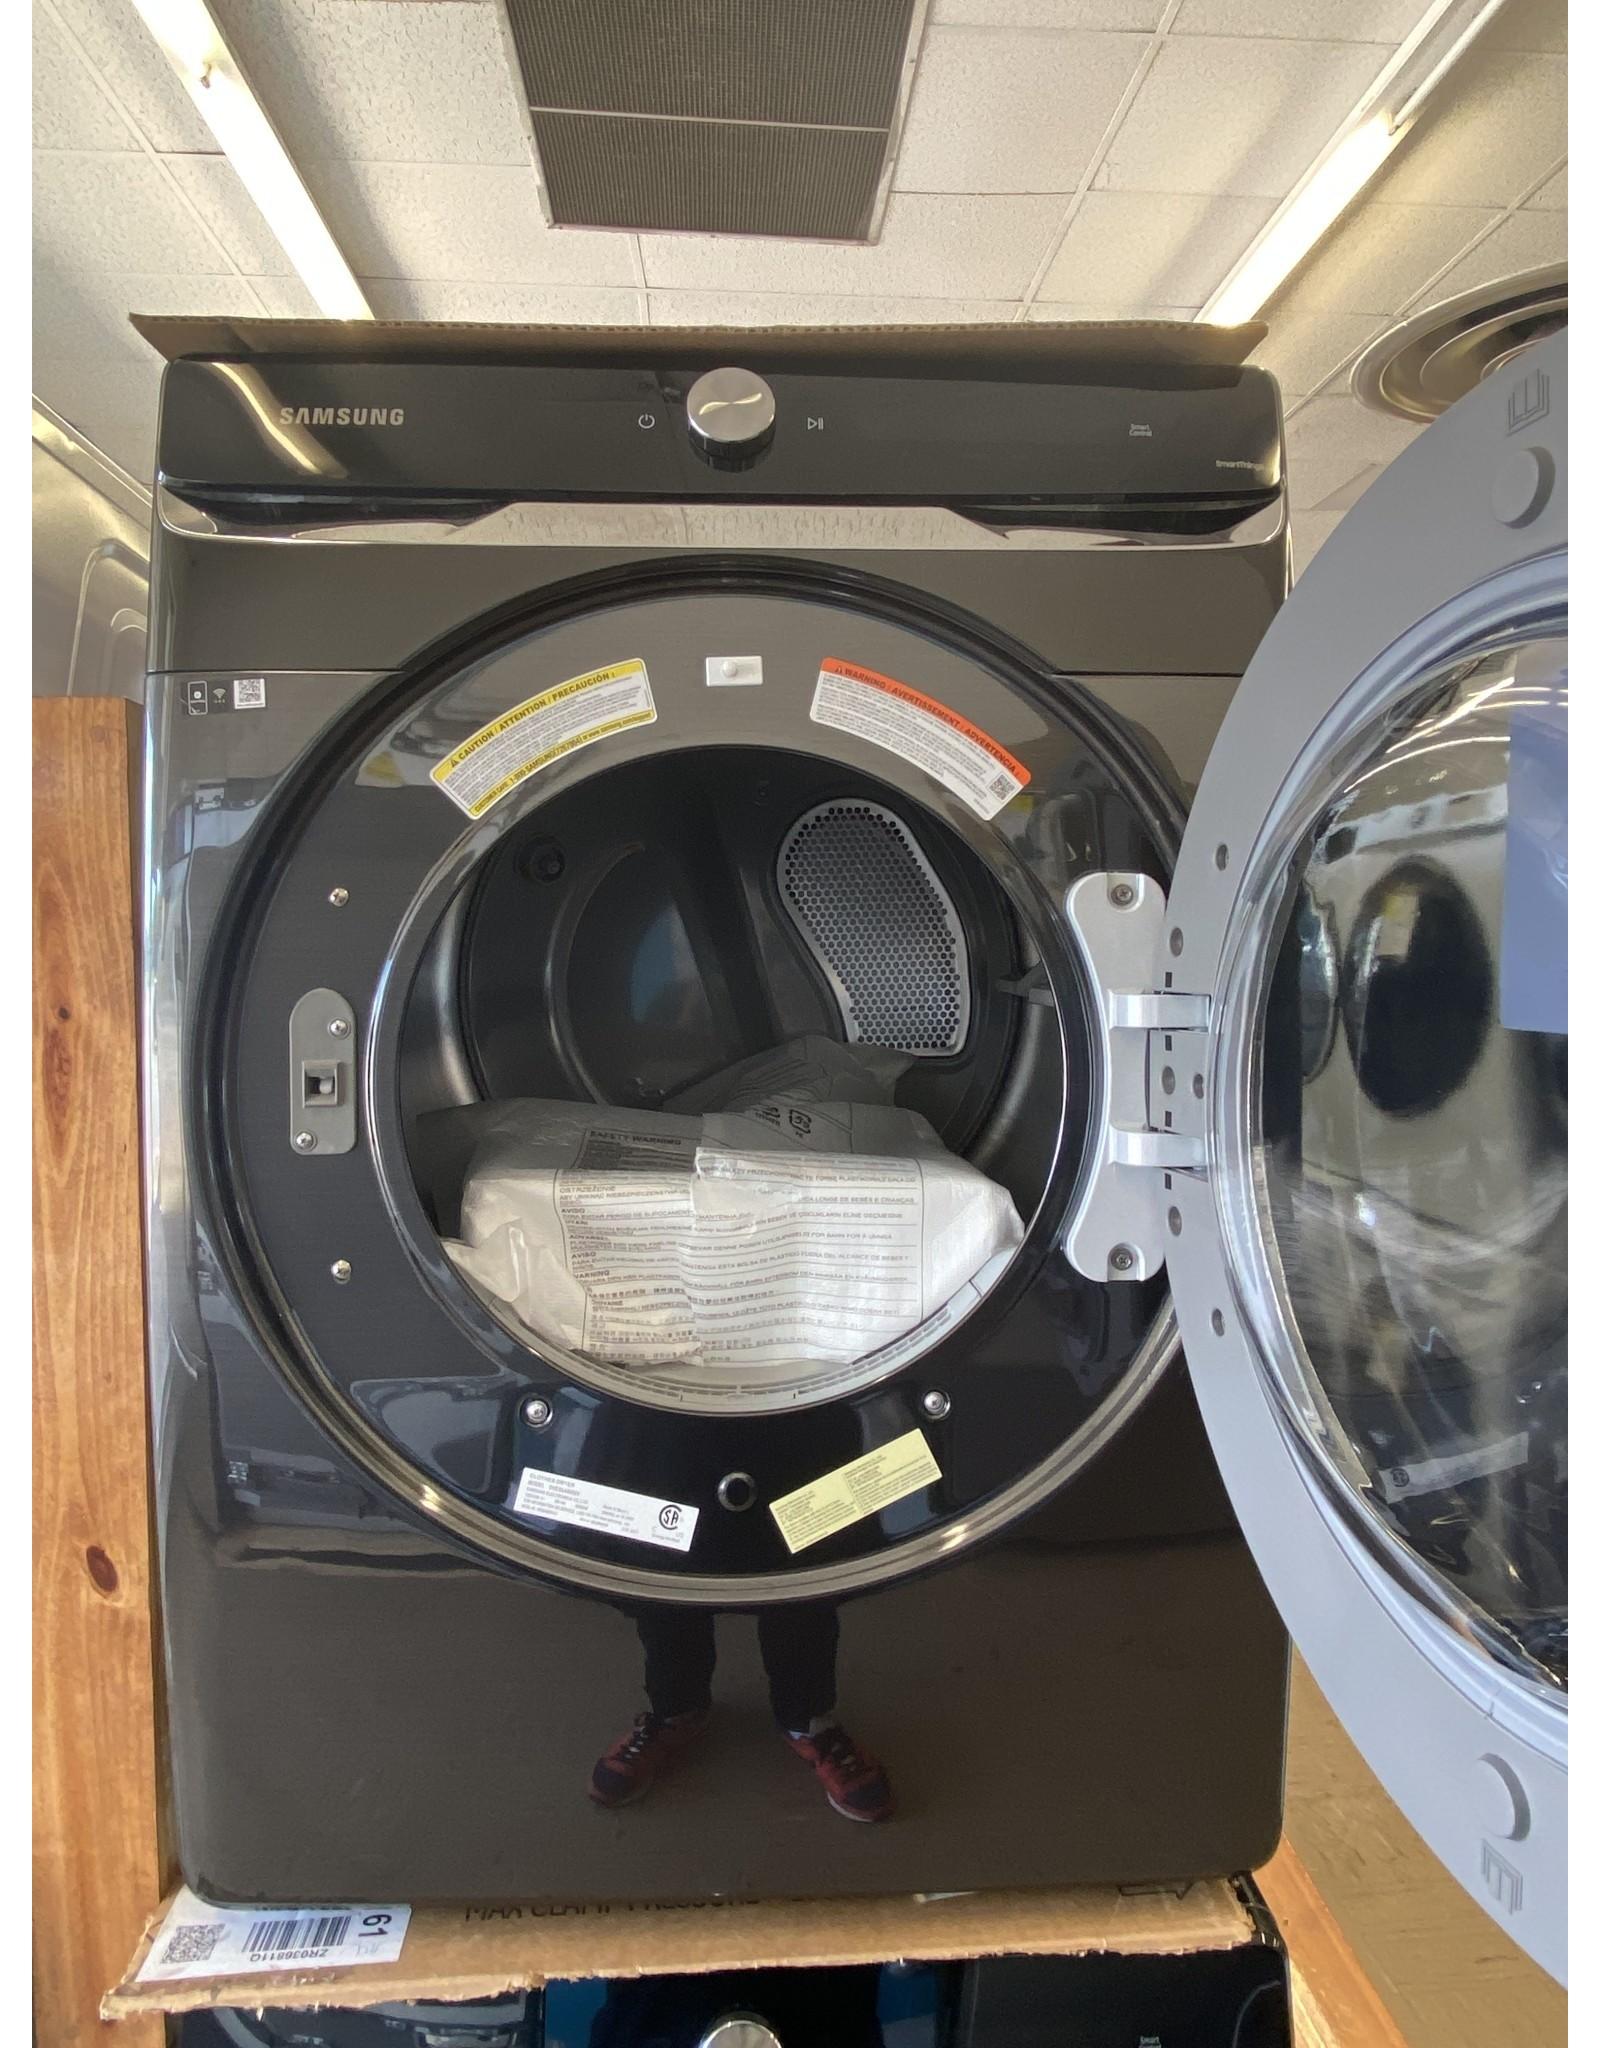 SAMSUNG DVE50A8800V 7.5 cu. ft. 240-Volt Brushed Black Electric Dryer with Smart Dial and Super Speed Dry, ENERGY STAR